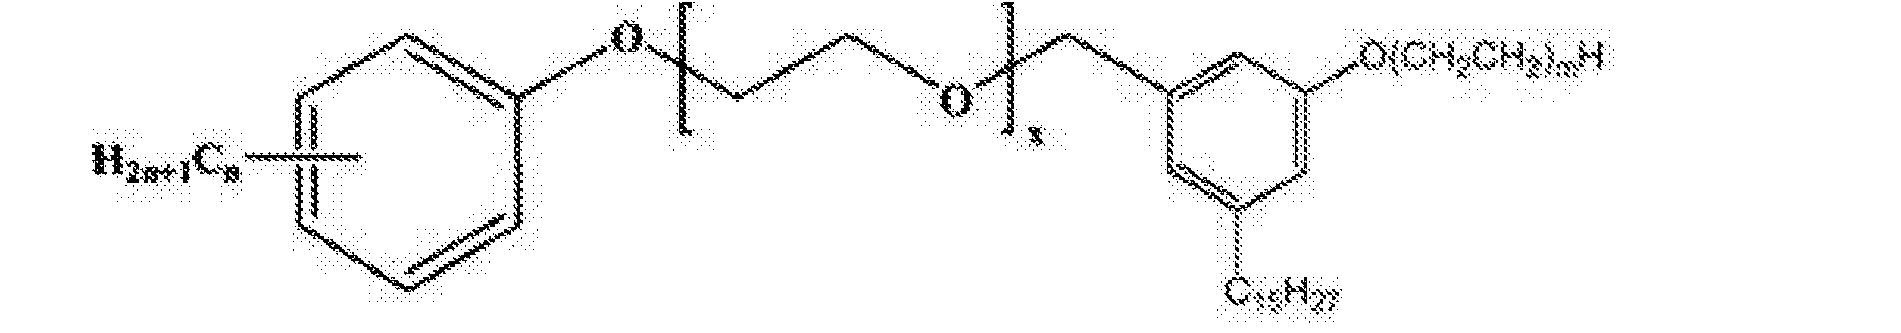 Figure CN106893640AD00031